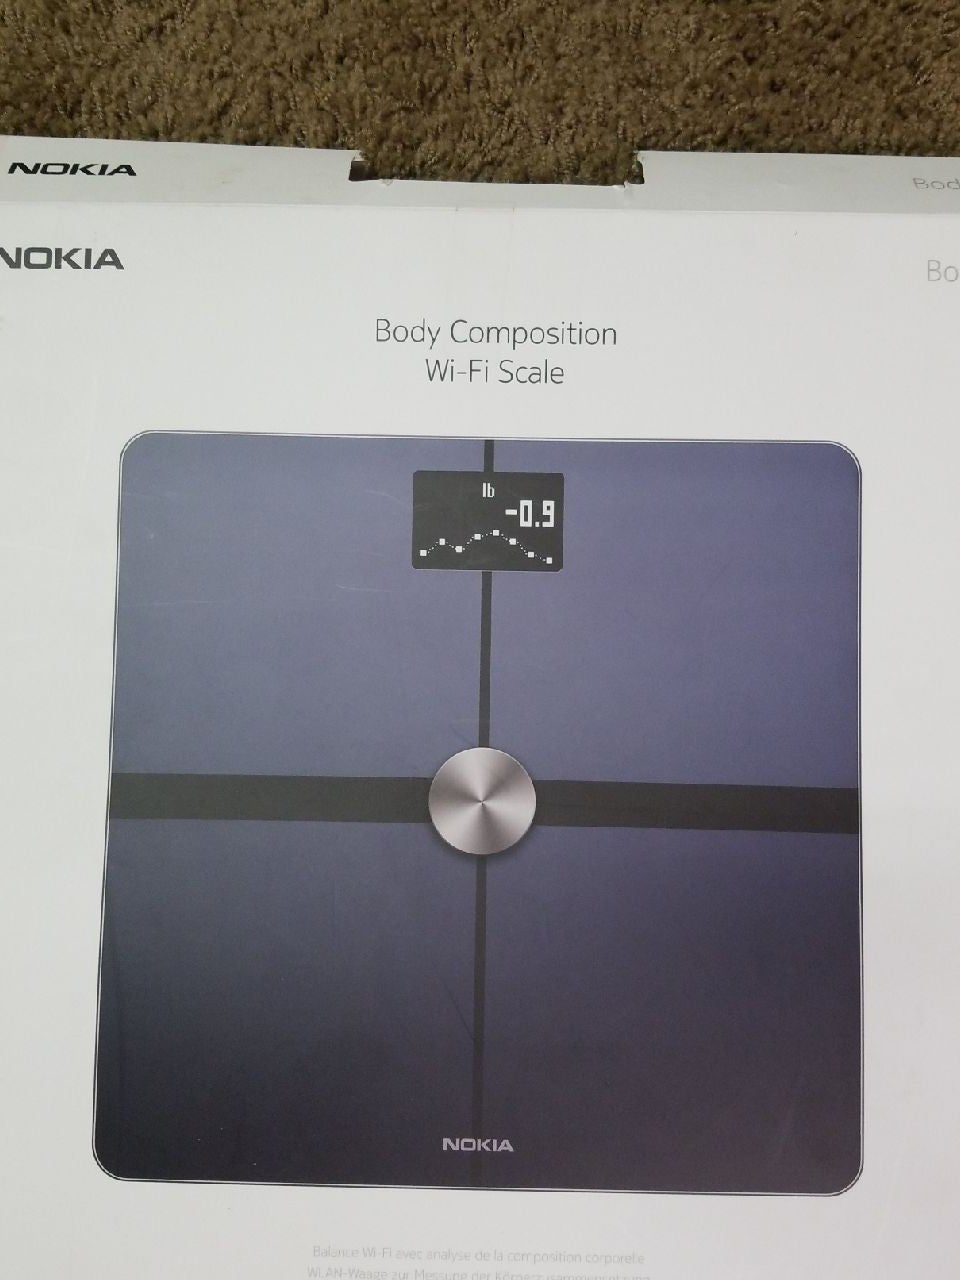 Nokia Body Composition Wifi Scale